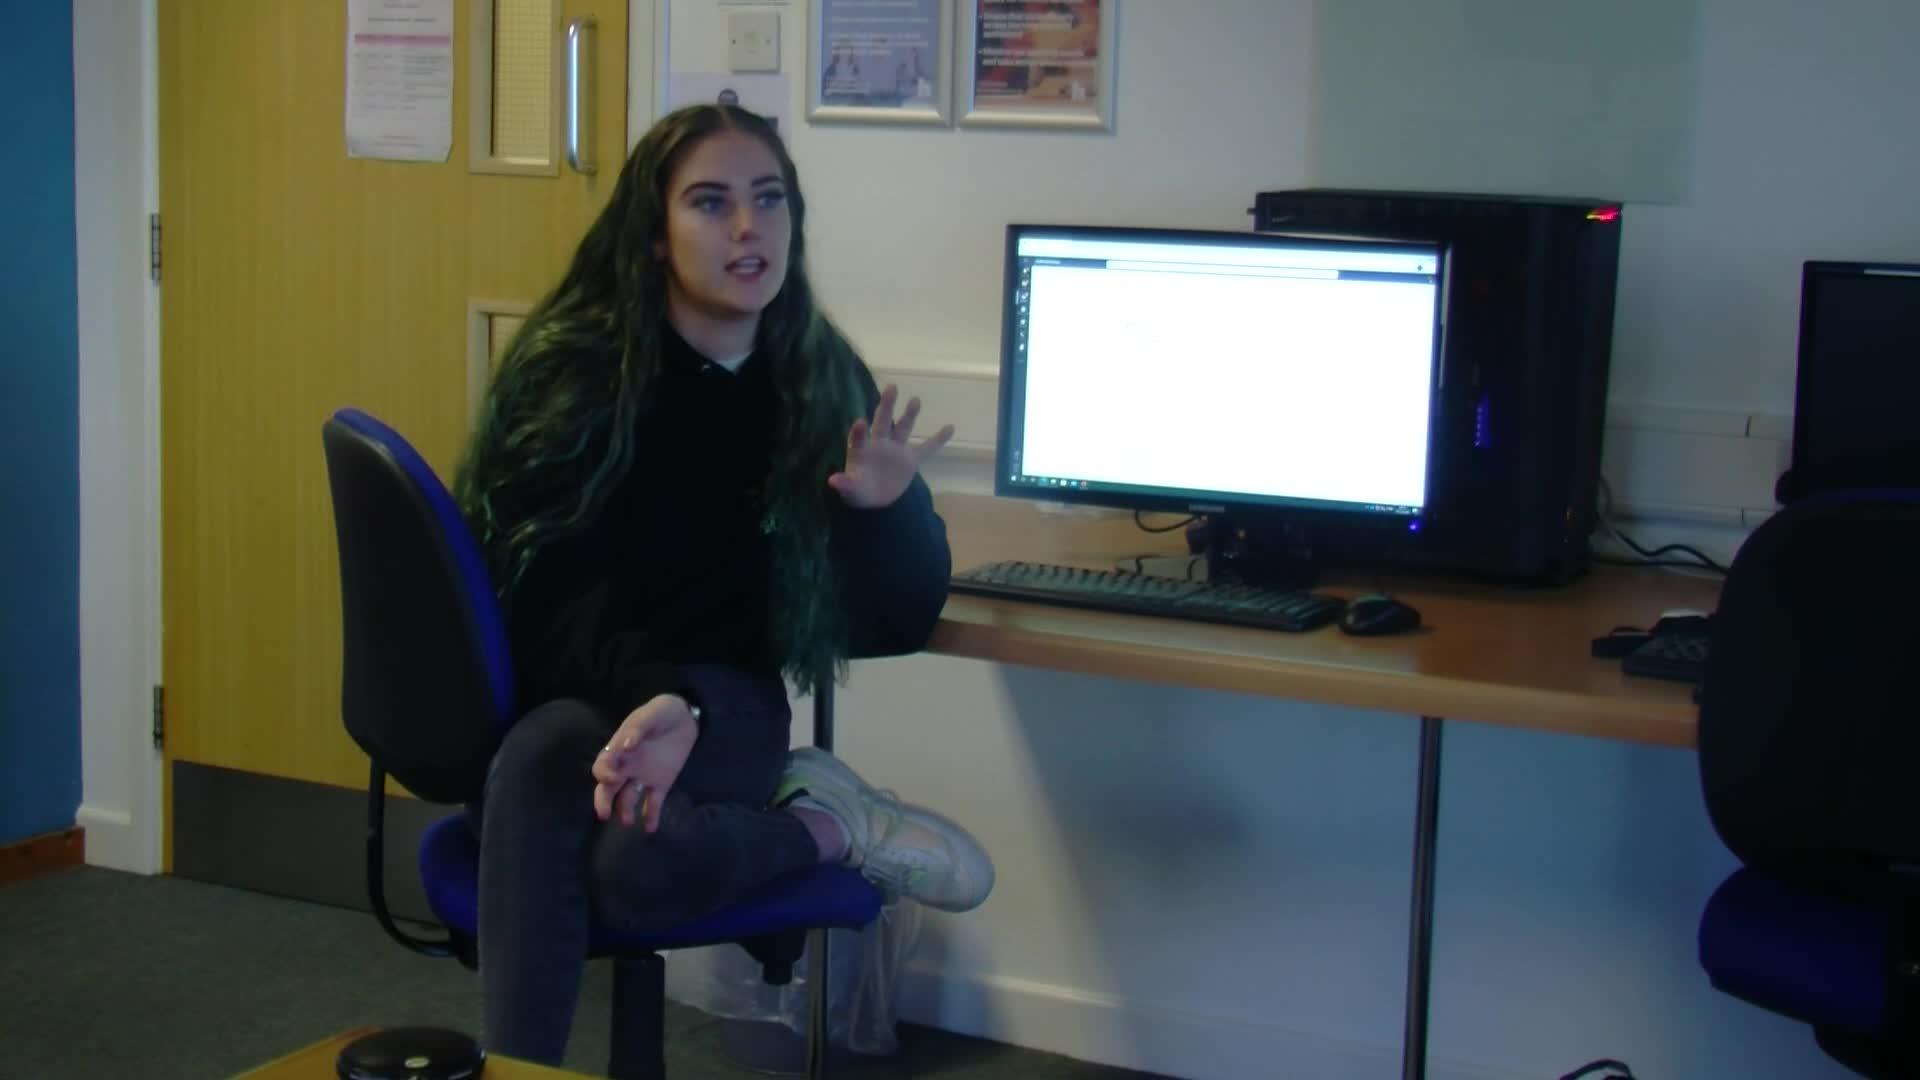 2072NDMDY1 - Unit 6 Video Production Pitches December 2020 - Samantha Kemp